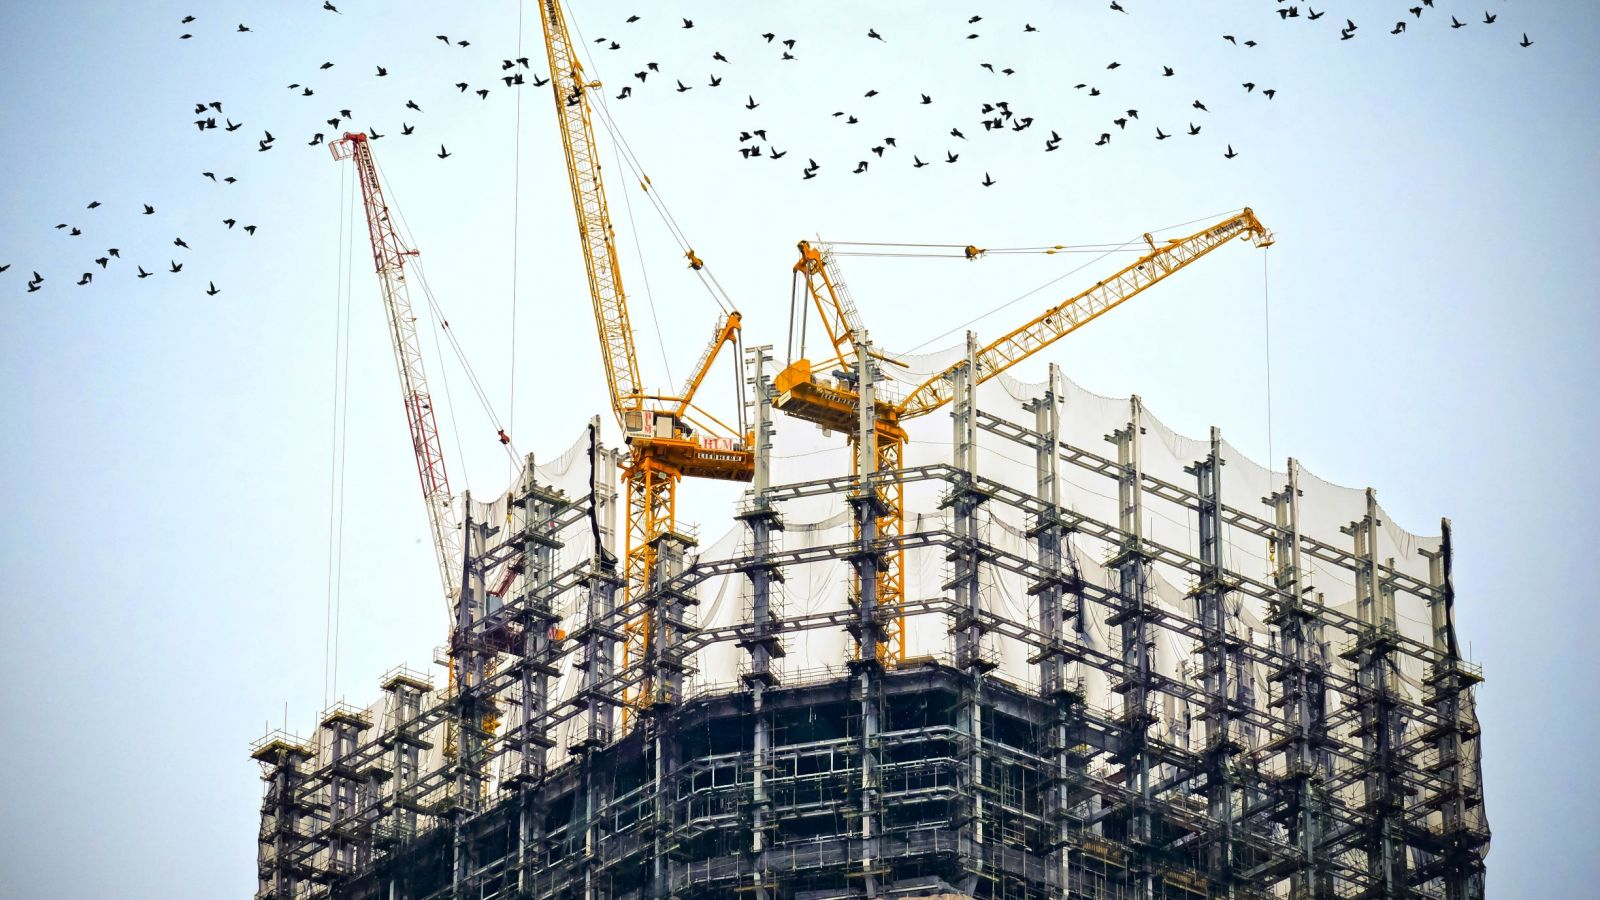 General Construction Risk Assessment Template